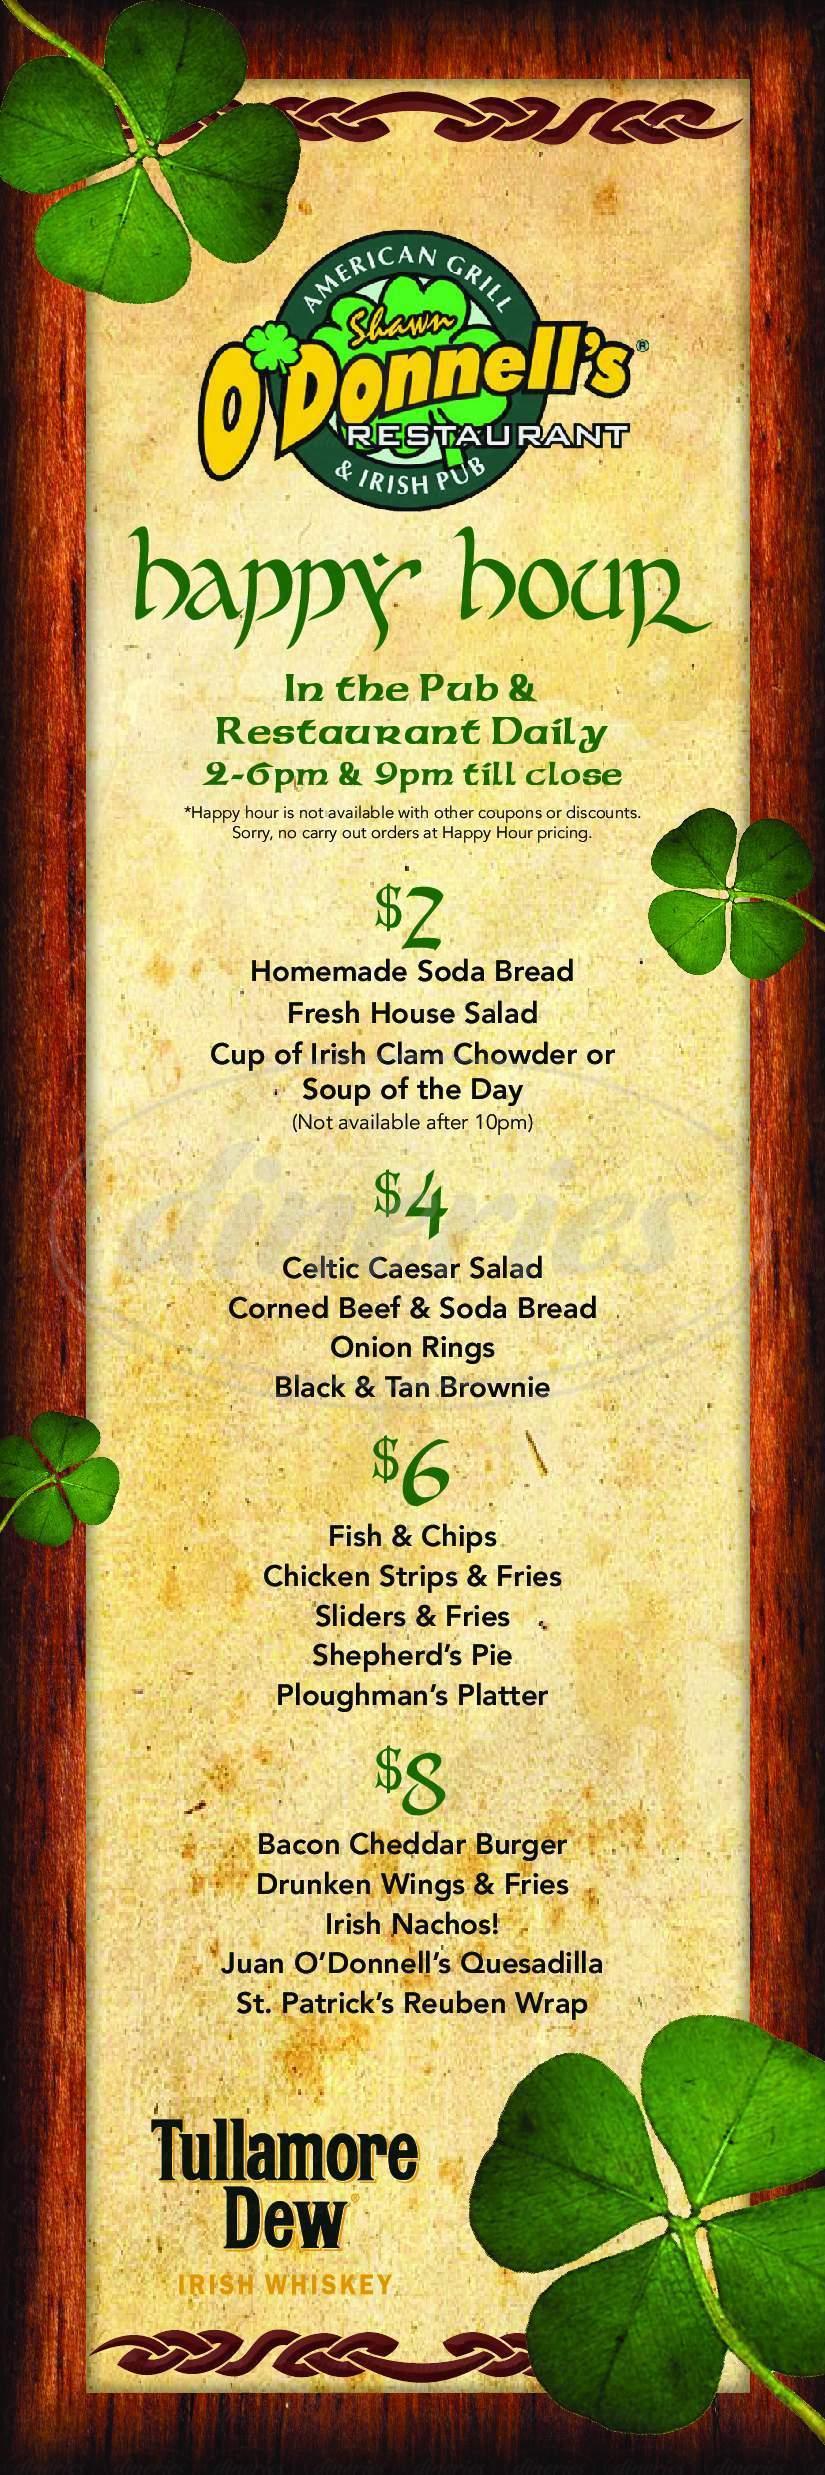 menu for Shawn O'Donnell's American Grill & Irish Pub